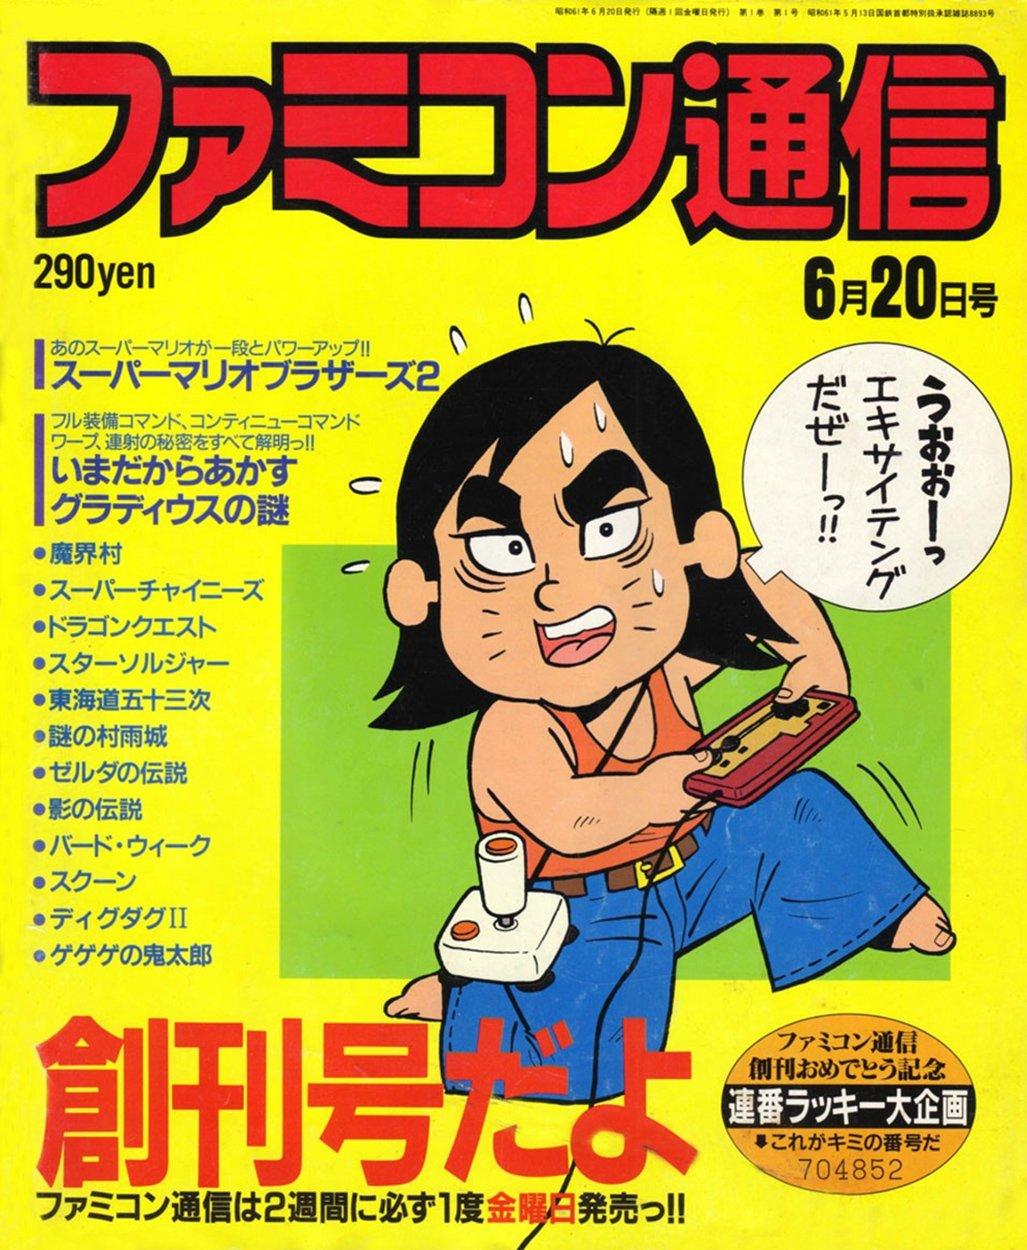 Famitsu 0001 (June 20, 1986)